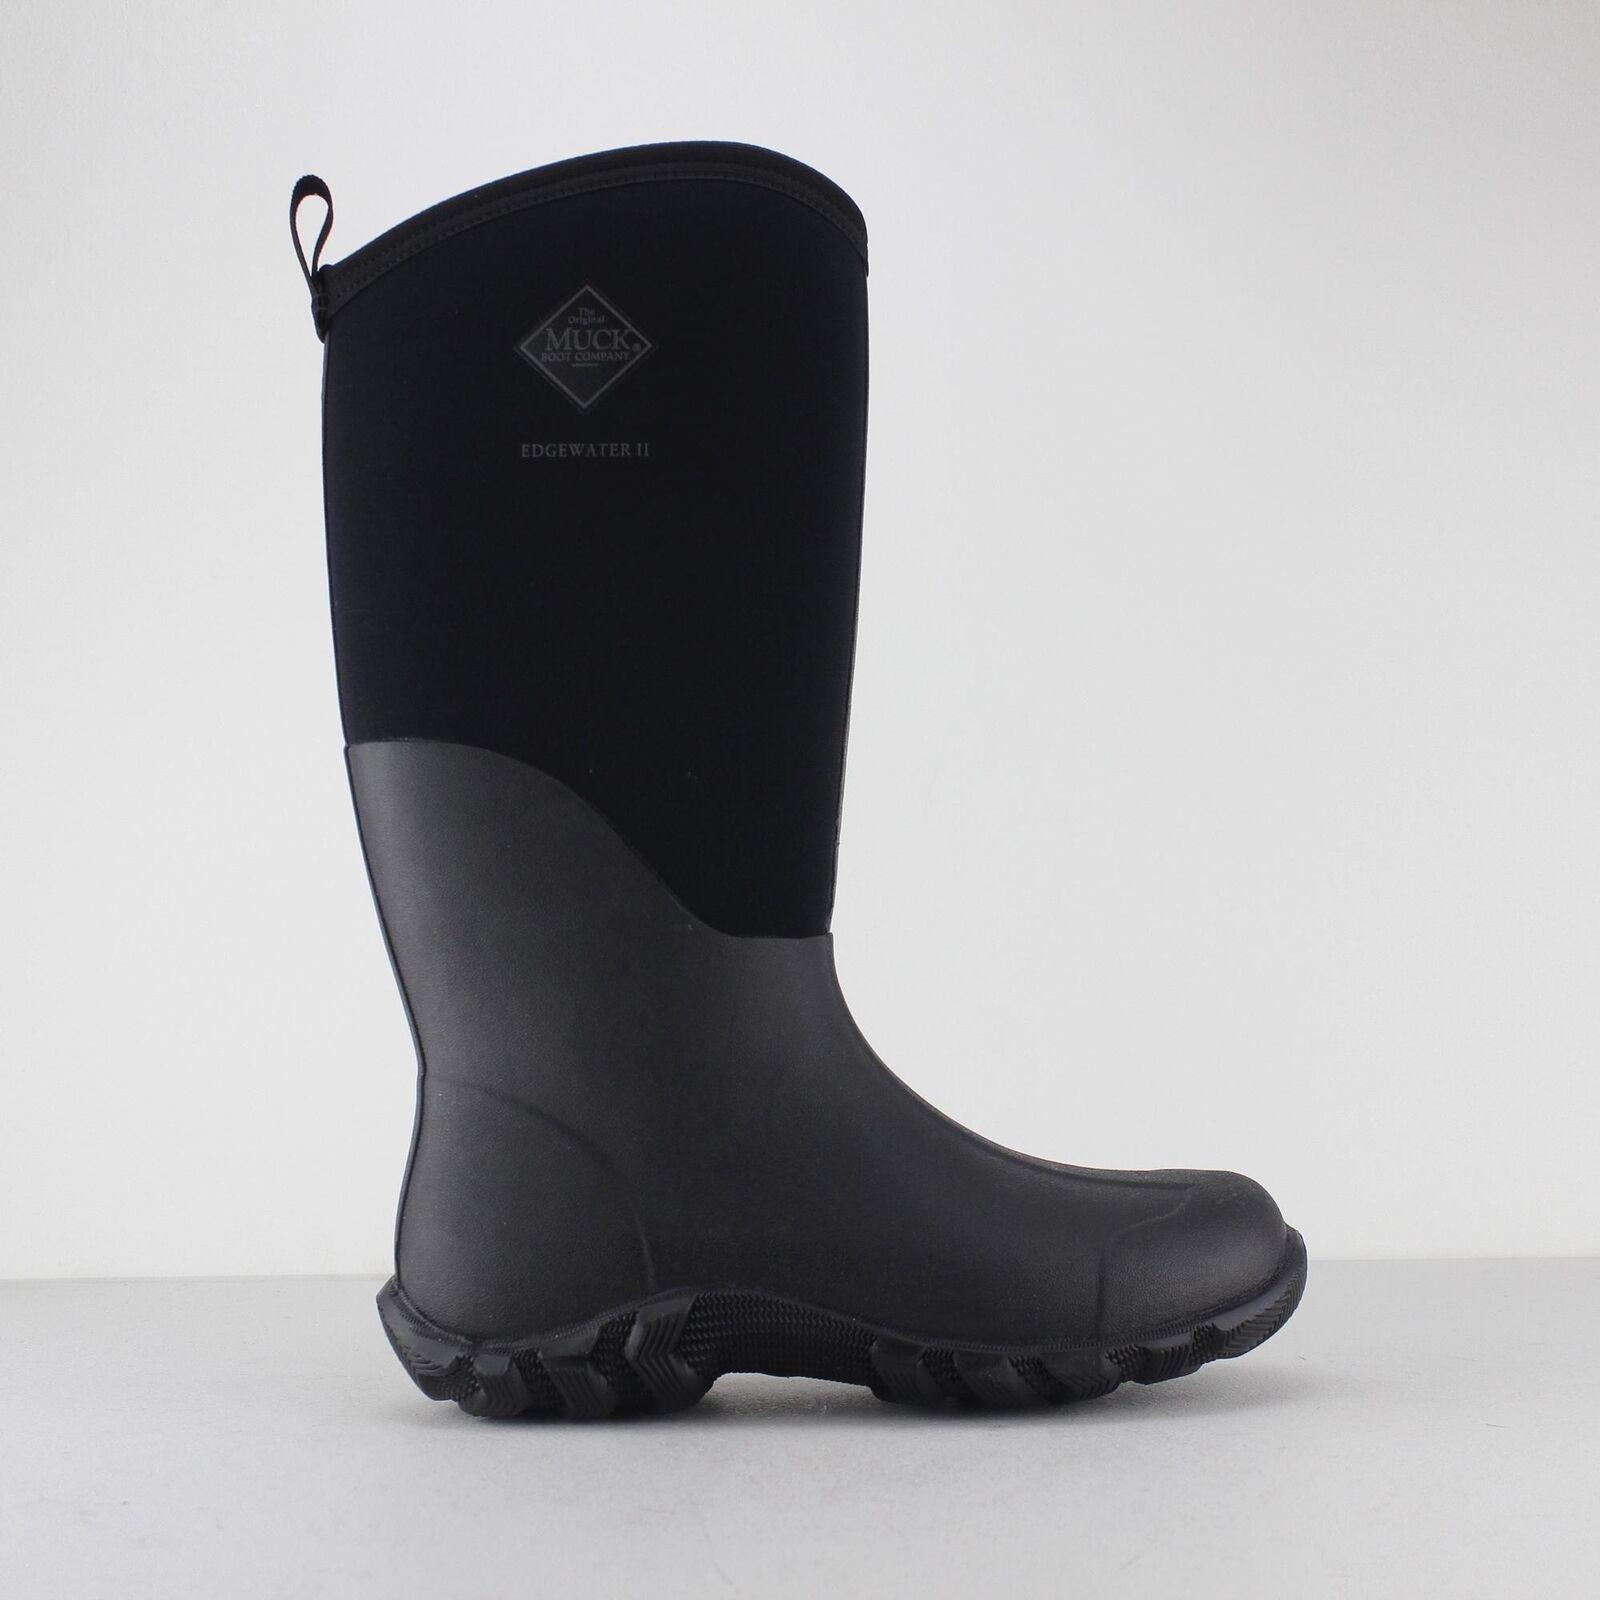 Muck Botas Edgewater II Unisex para Hombre Hombre Hombre para Mujer Wellington Impermeable Botas De Lluvia Nuevo 0e17e6